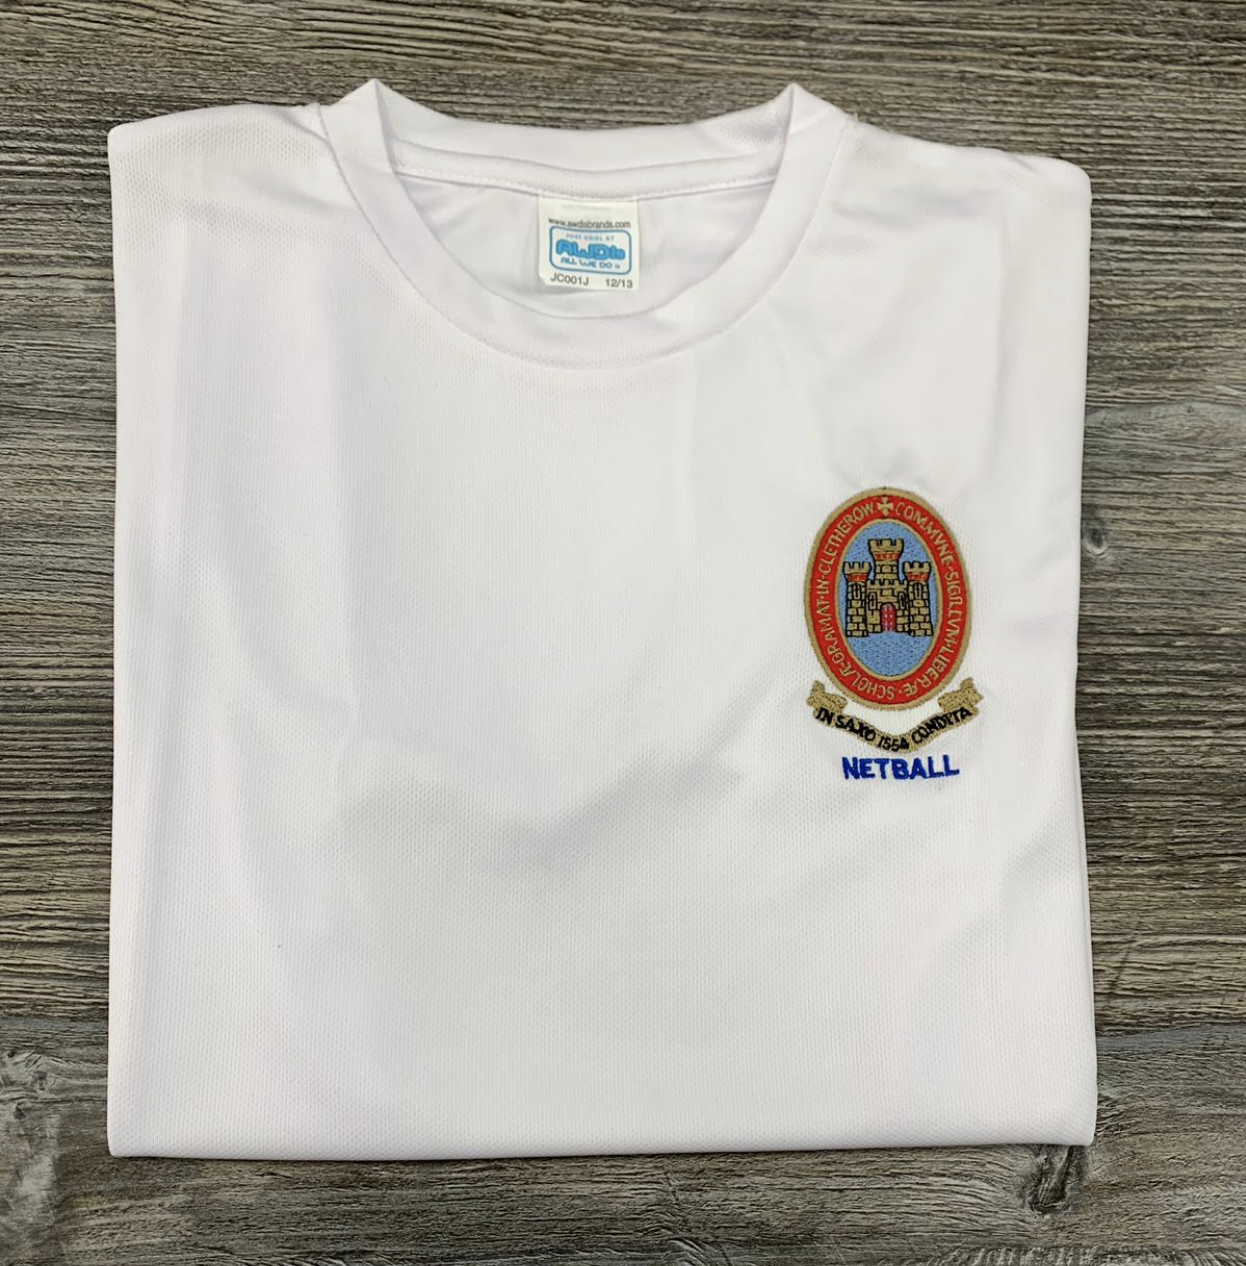 CRGS Netball T-Shirt